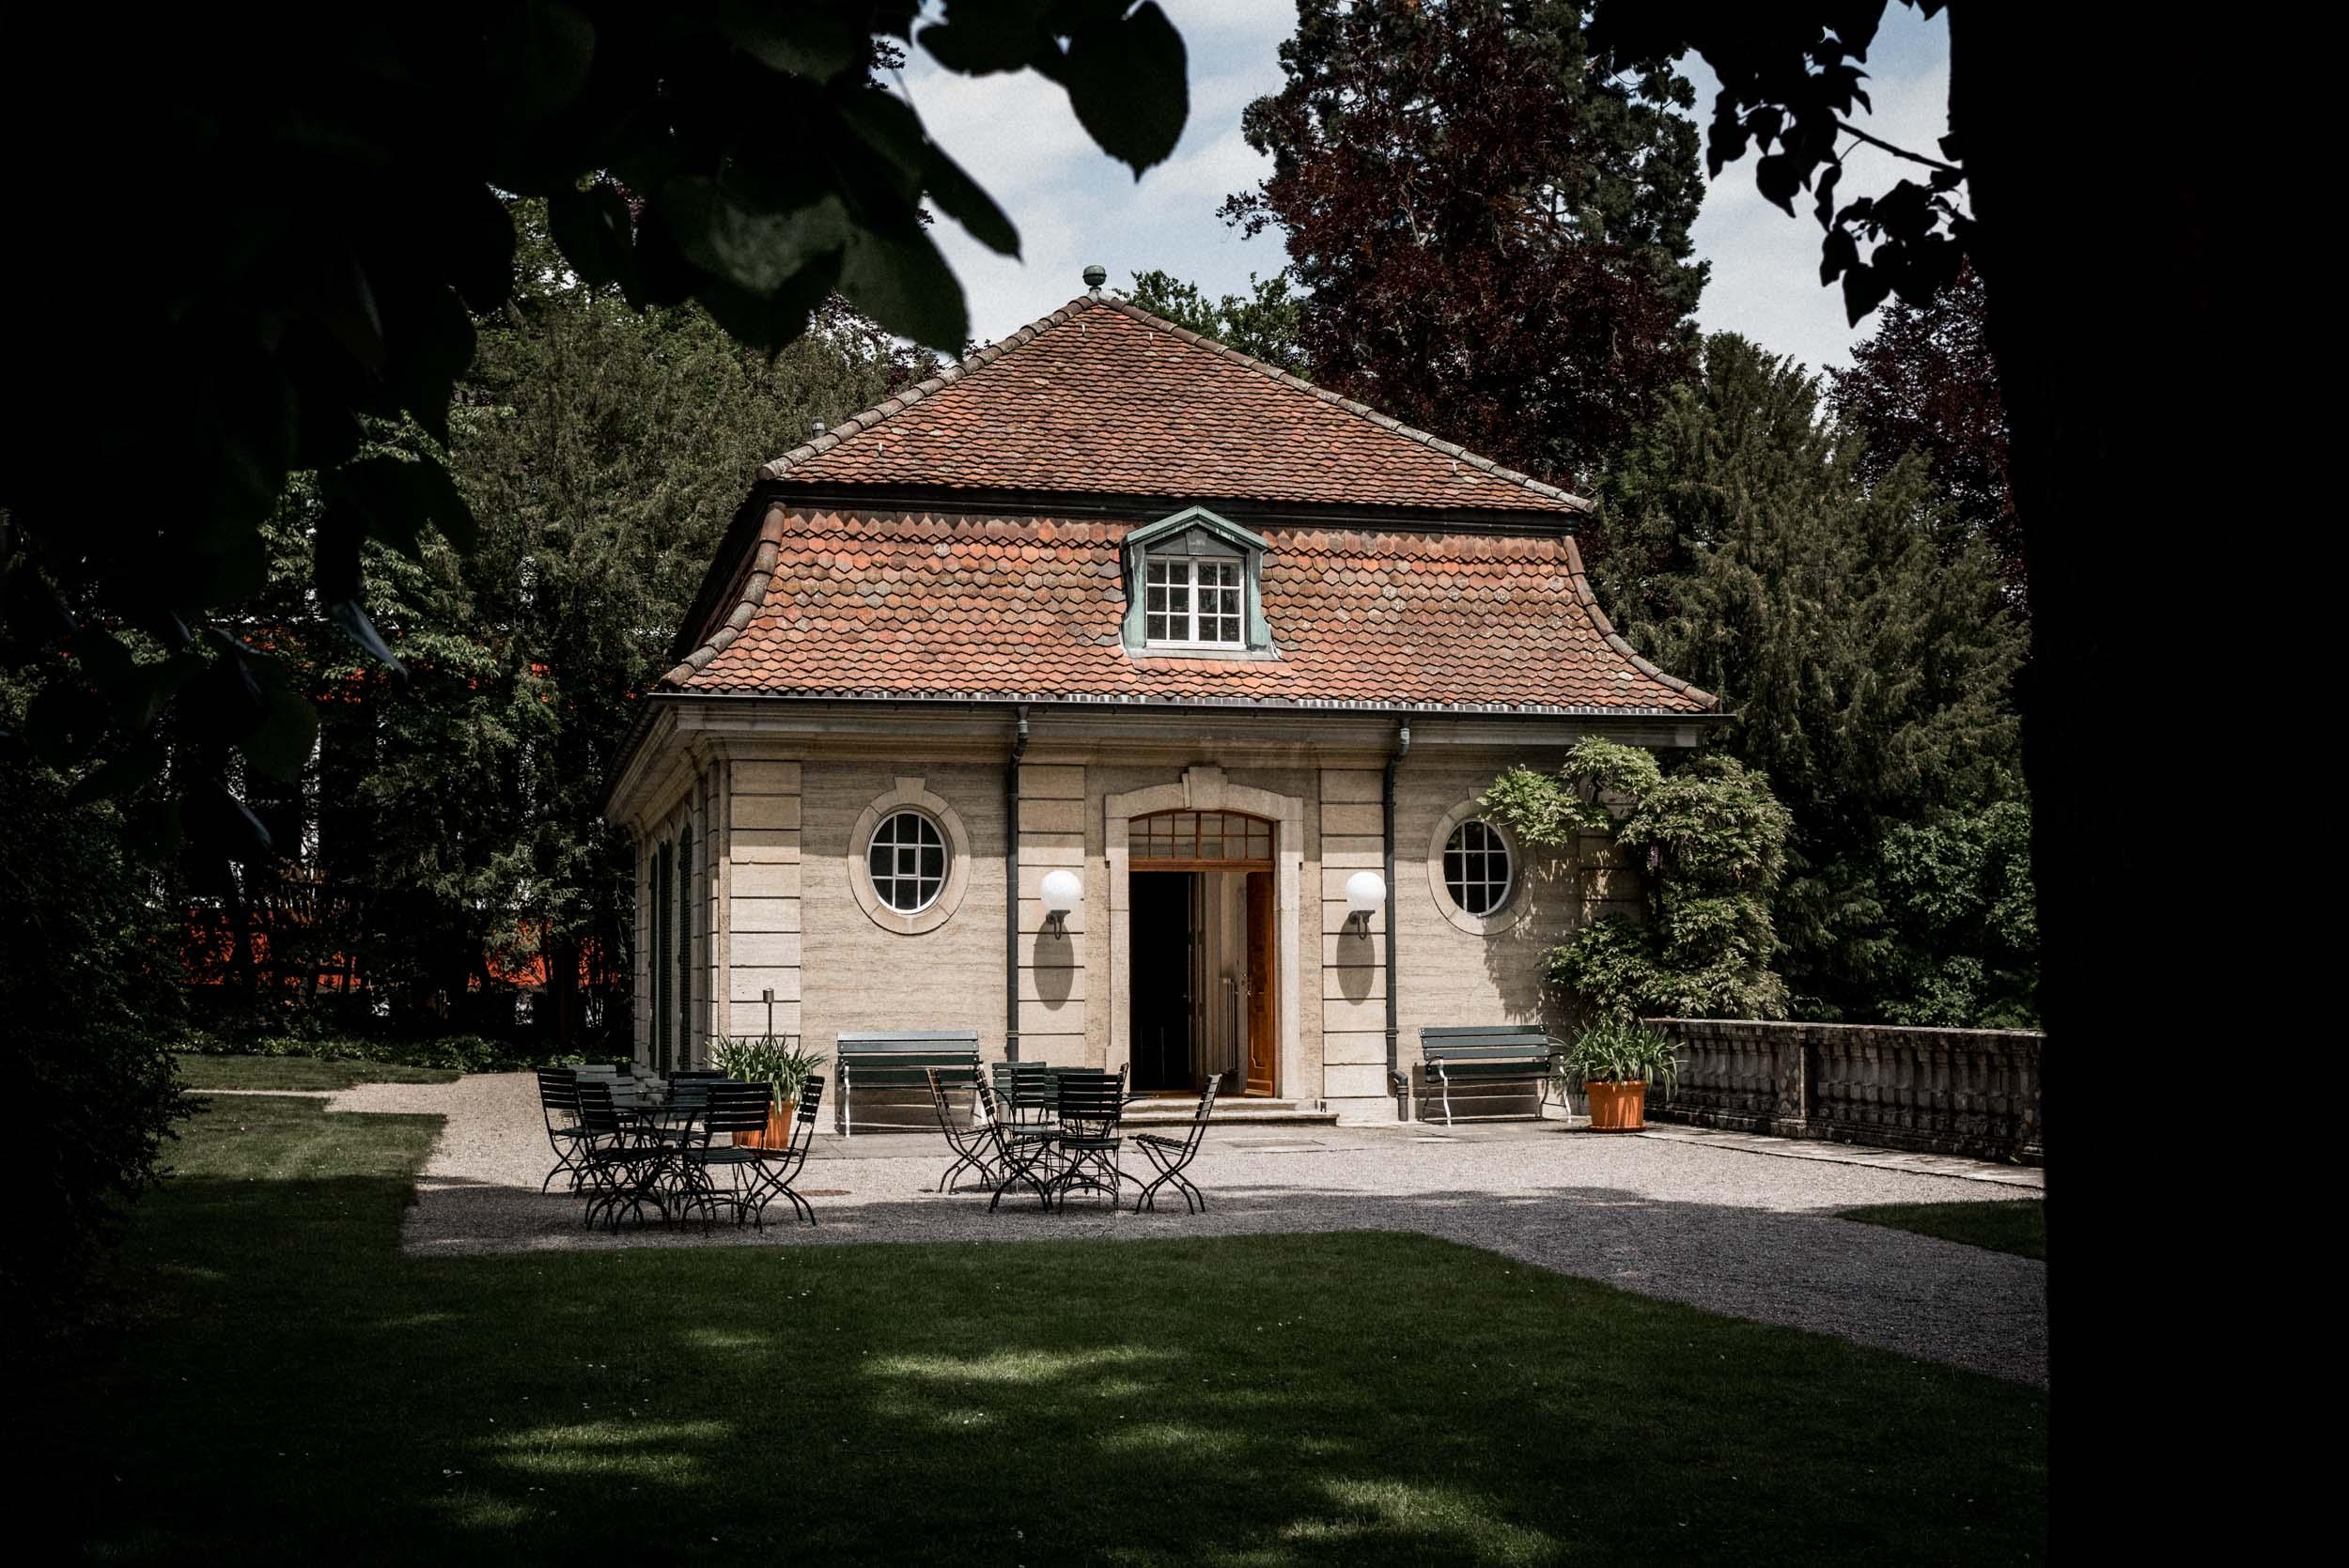 Hochzeitsreportage-Baden-Aargau_2019_24.jpg